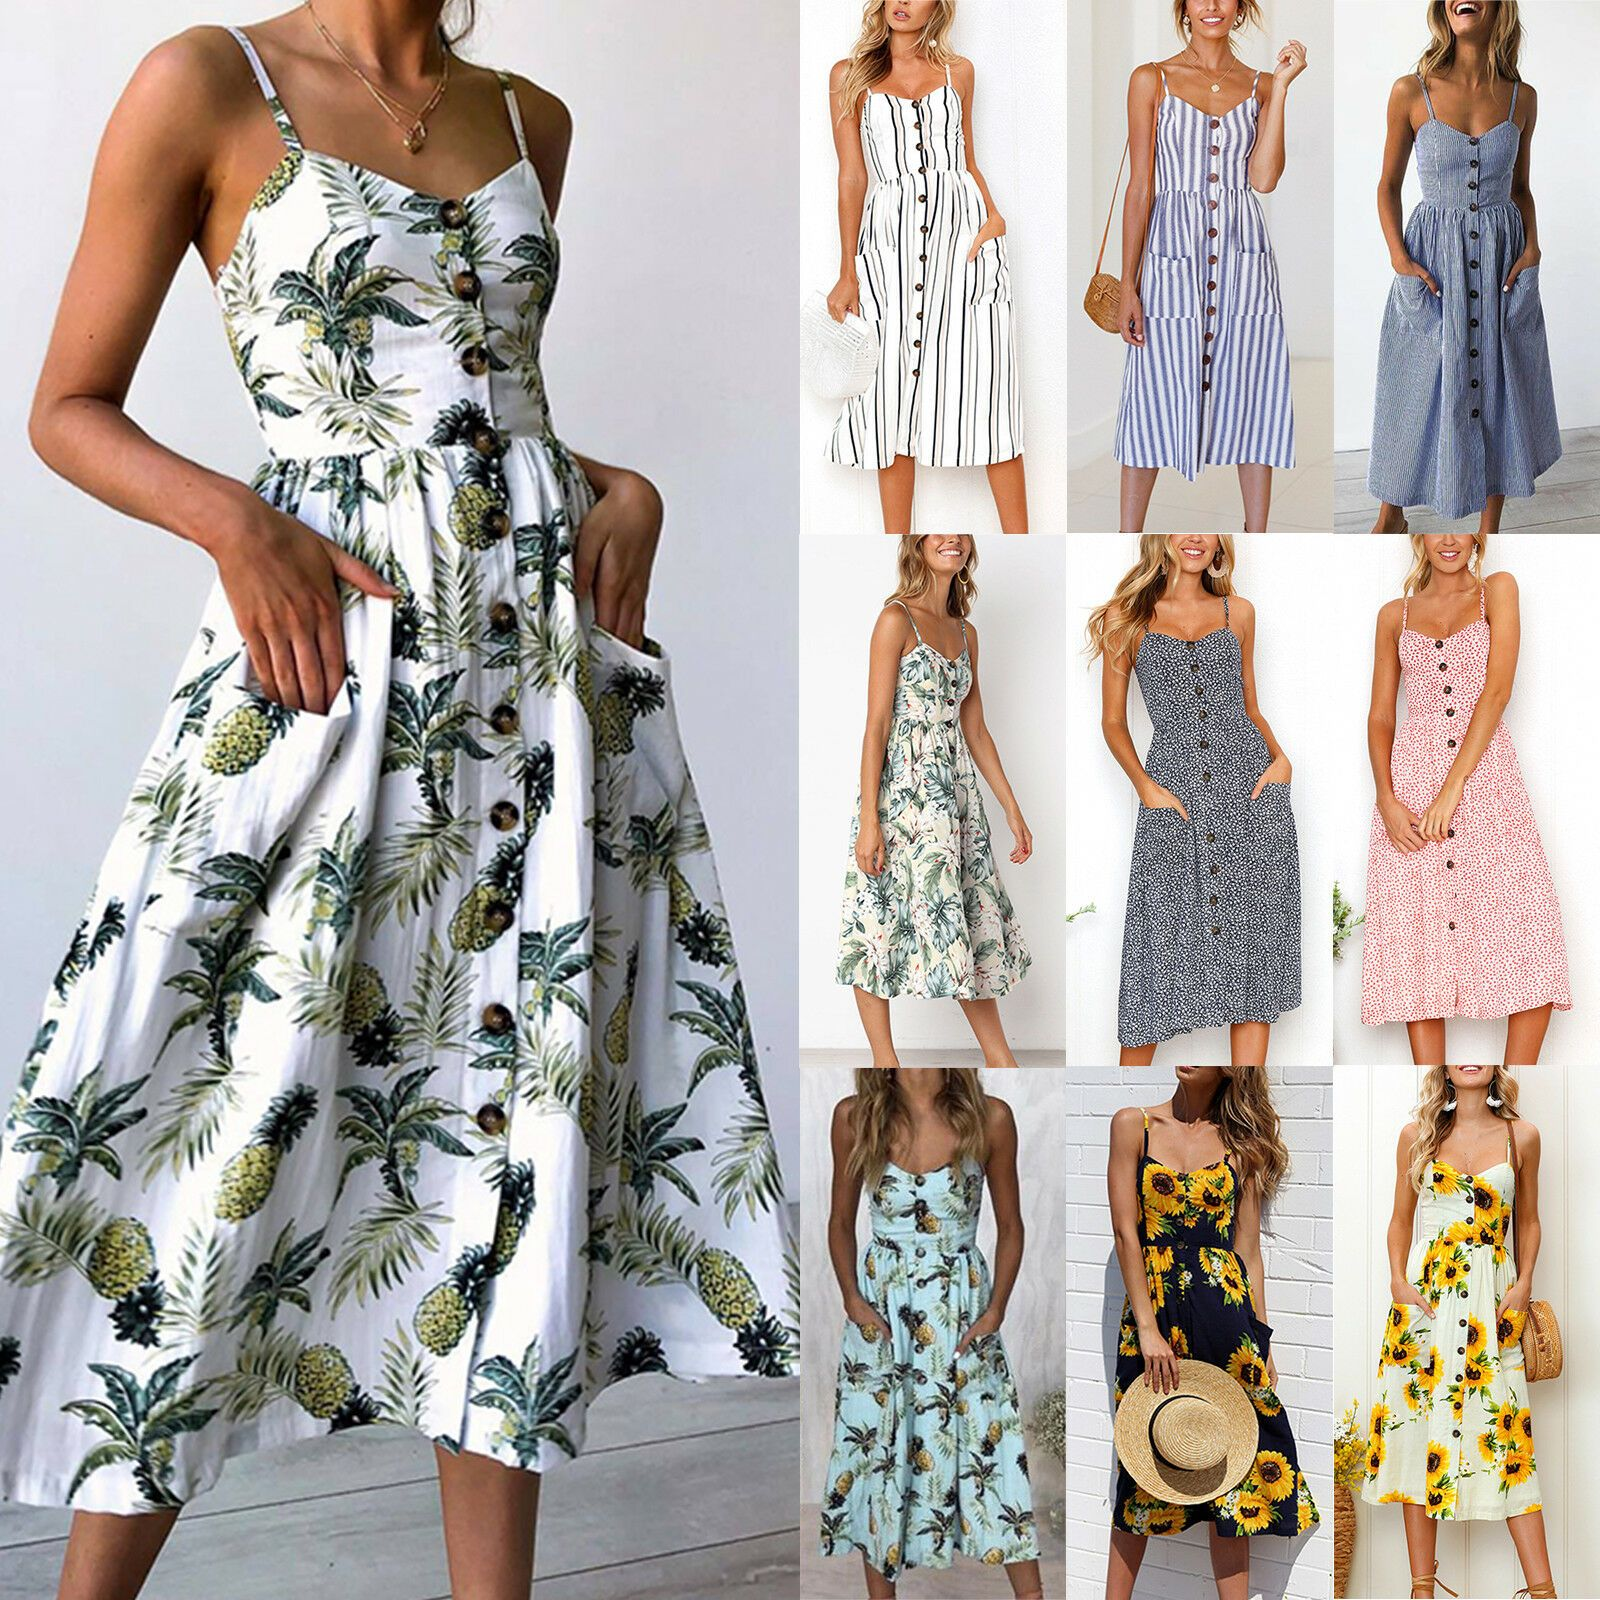 Women Loose Vest Swing Dress Sleeveless Casual V Neck Summer Skirt Plus Size Midi Dresses Shop For Maxi Dress Cocktail Maxi Dress Evening Midi Dress Party [ 1600 x 1600 Pixel ]